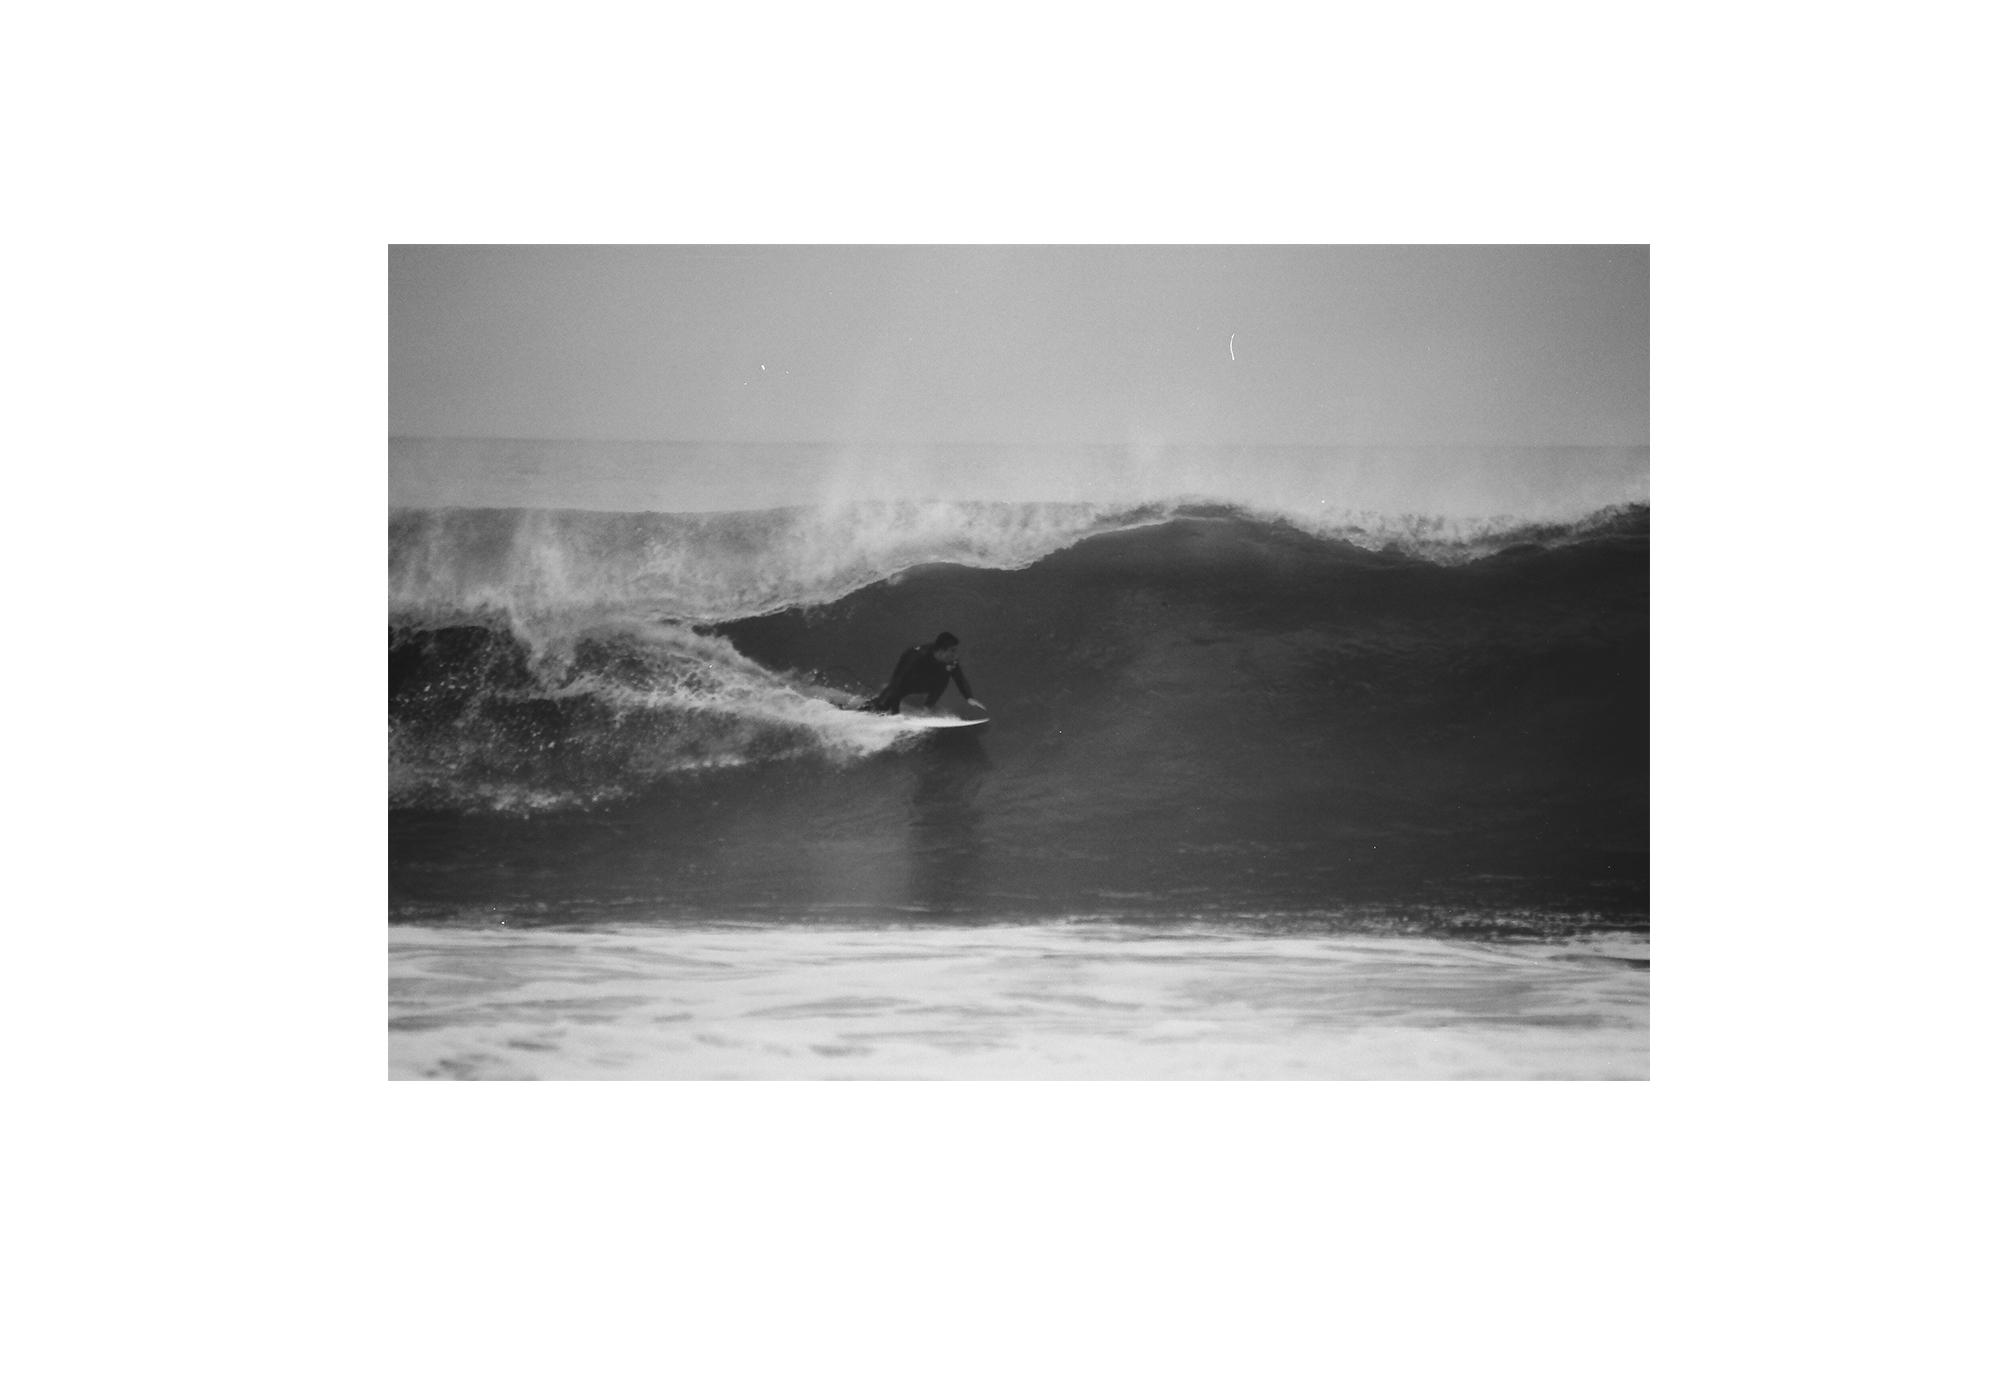 Surf_Flm_Frame_01_WEB.jpg